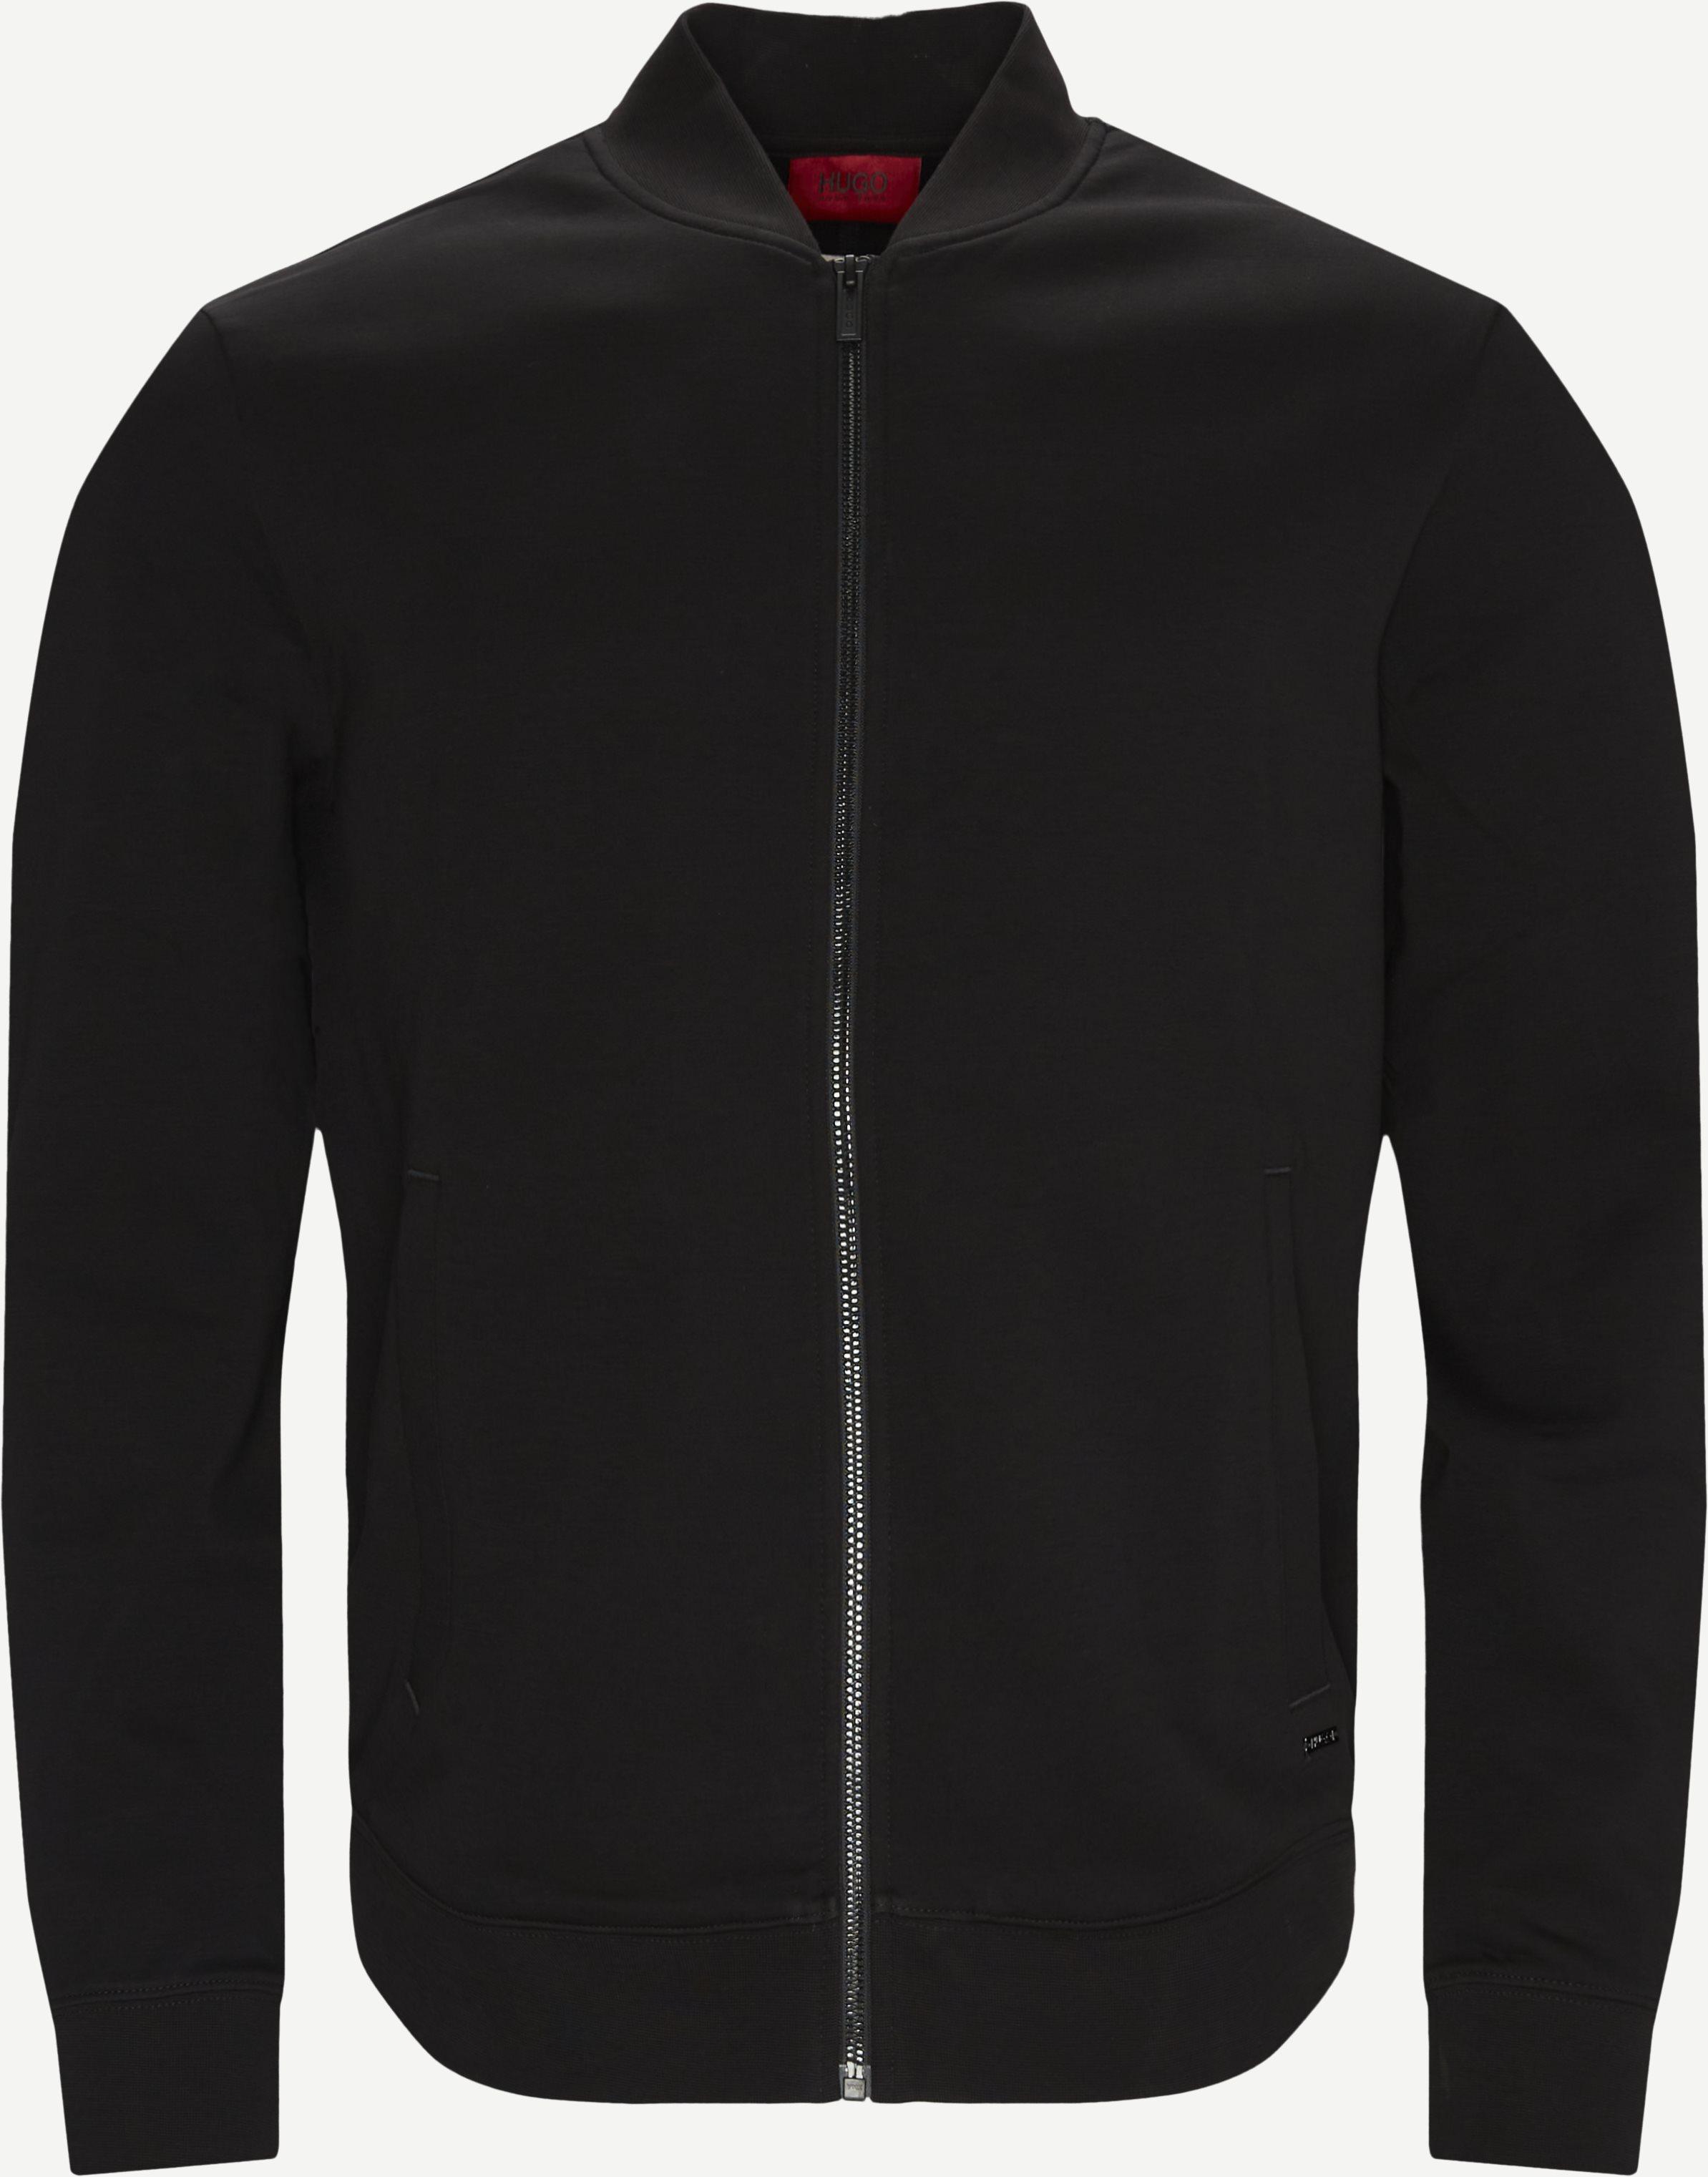 Sweatshirts - Loose fit - Black